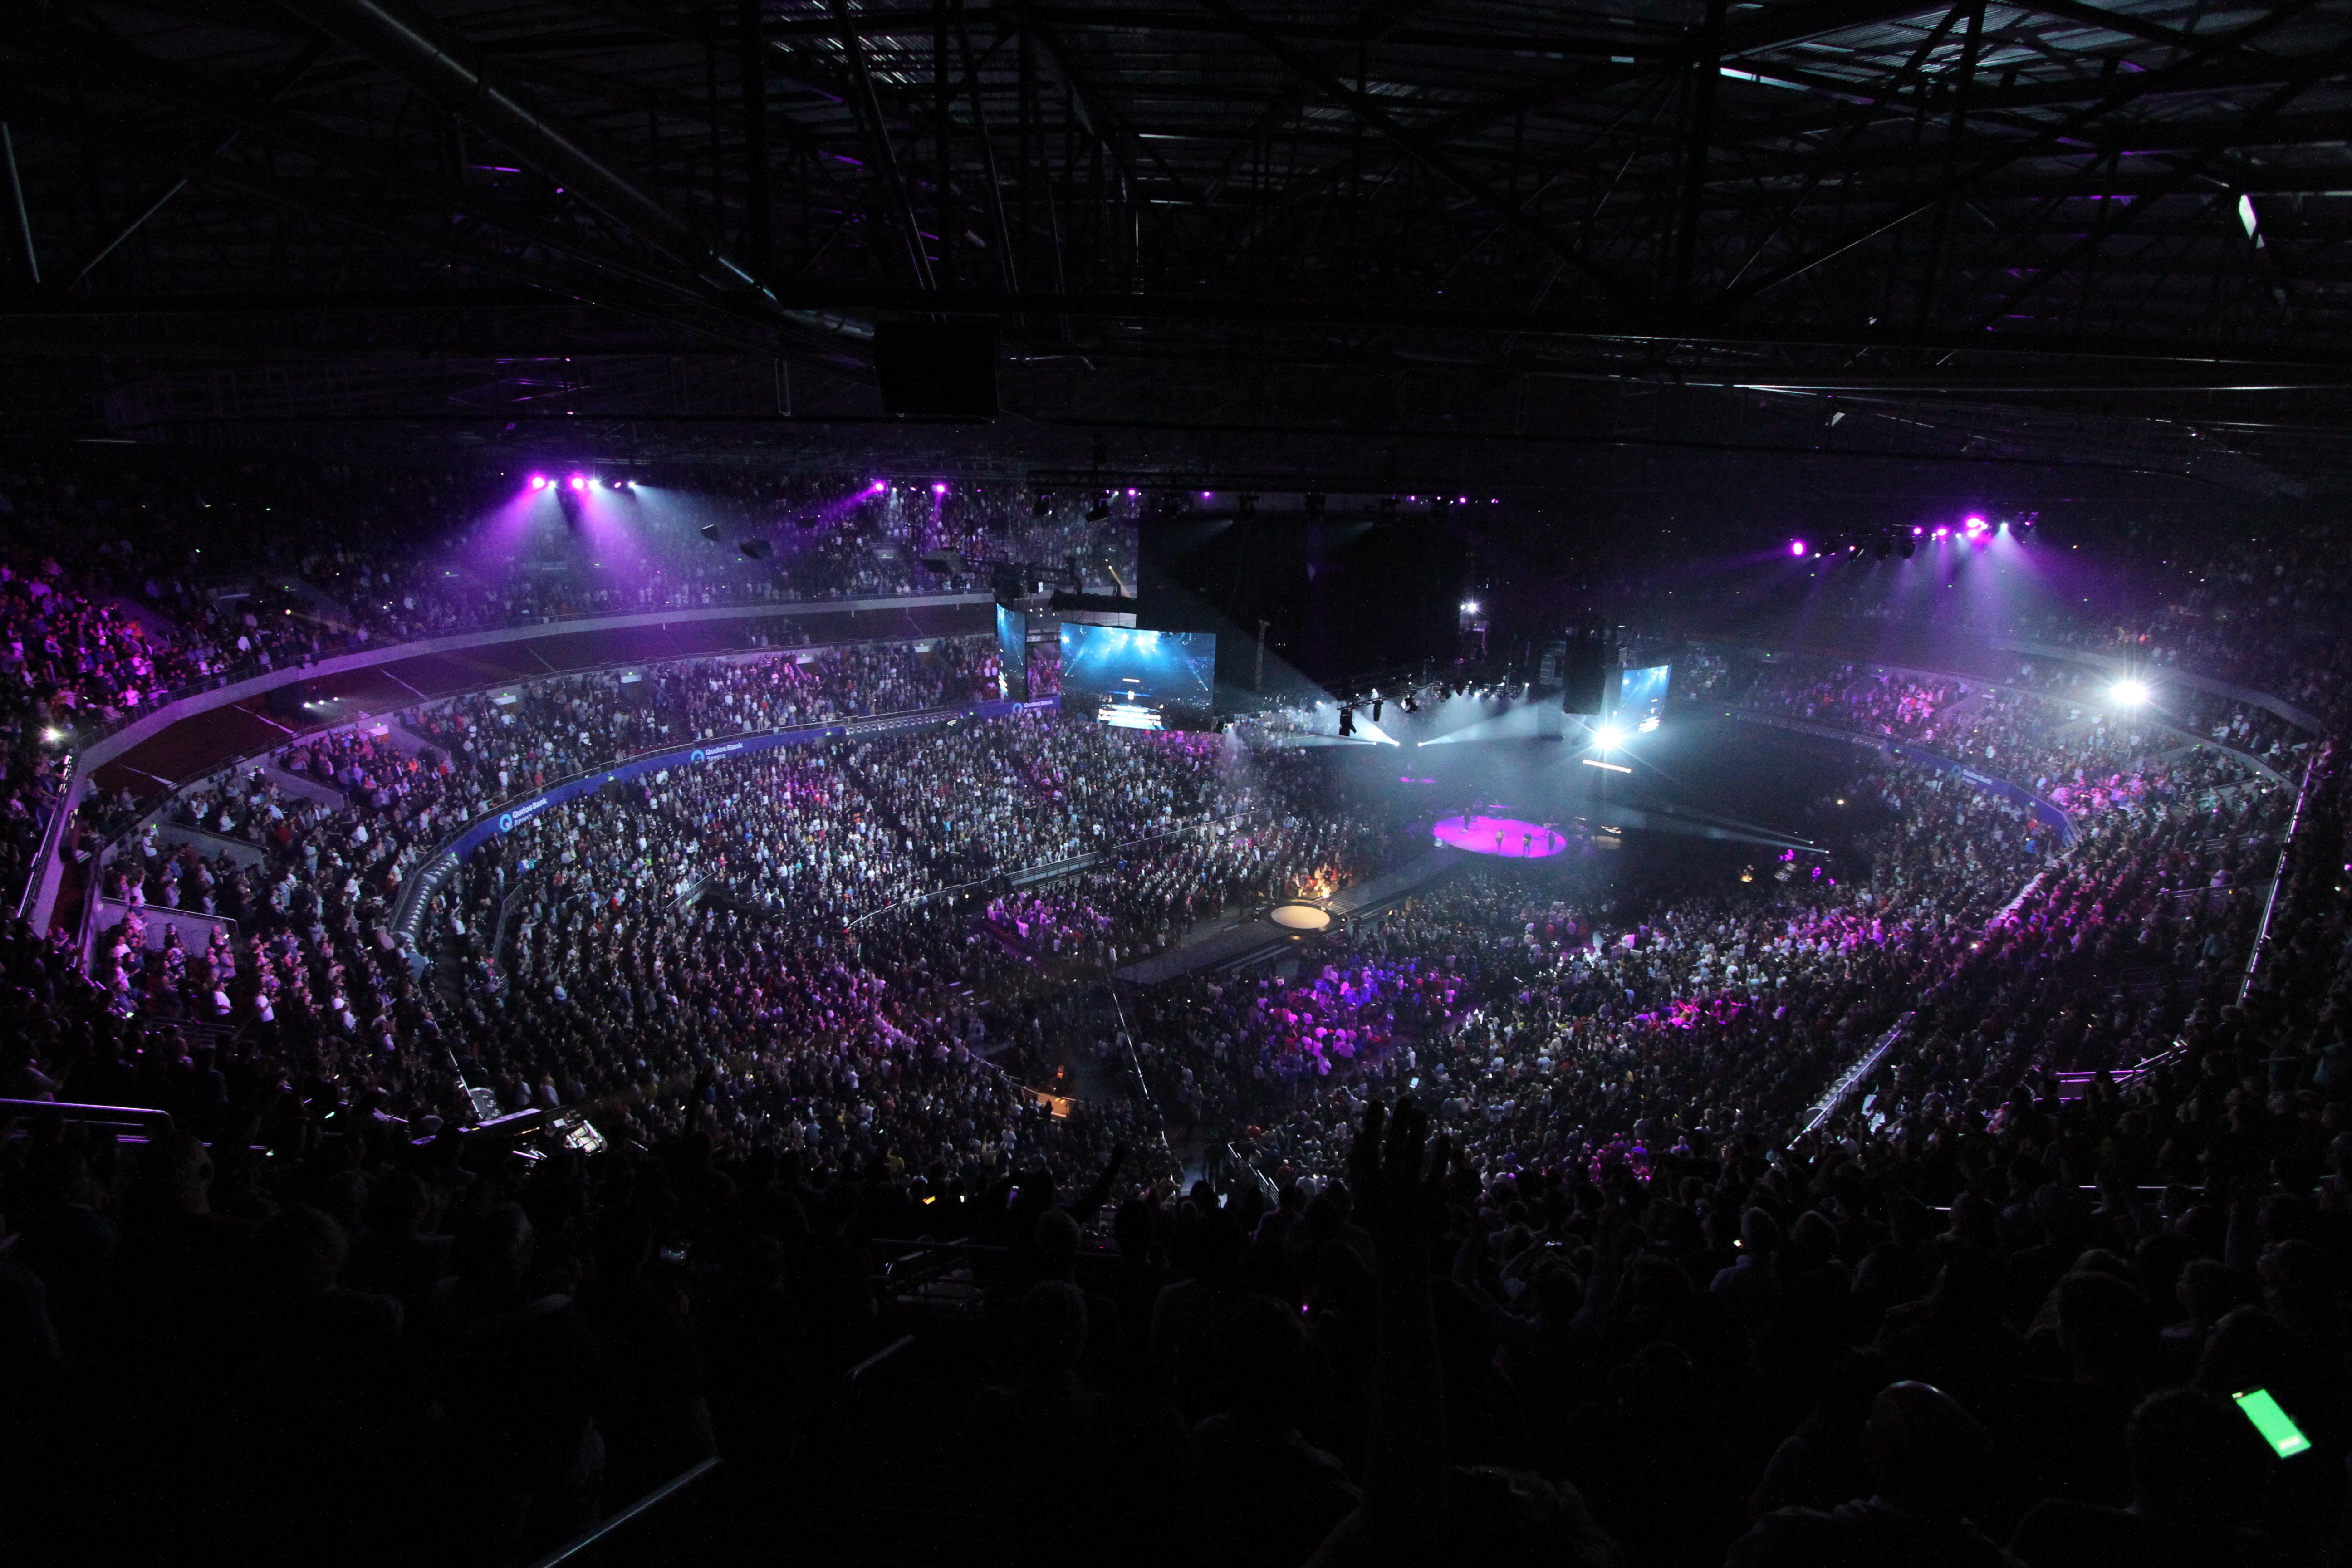 Crowd Dark Concert Audience Stadium Rave Lights Stage Performance Venue Entertainment Disco Nightclub Performing Arts Rock